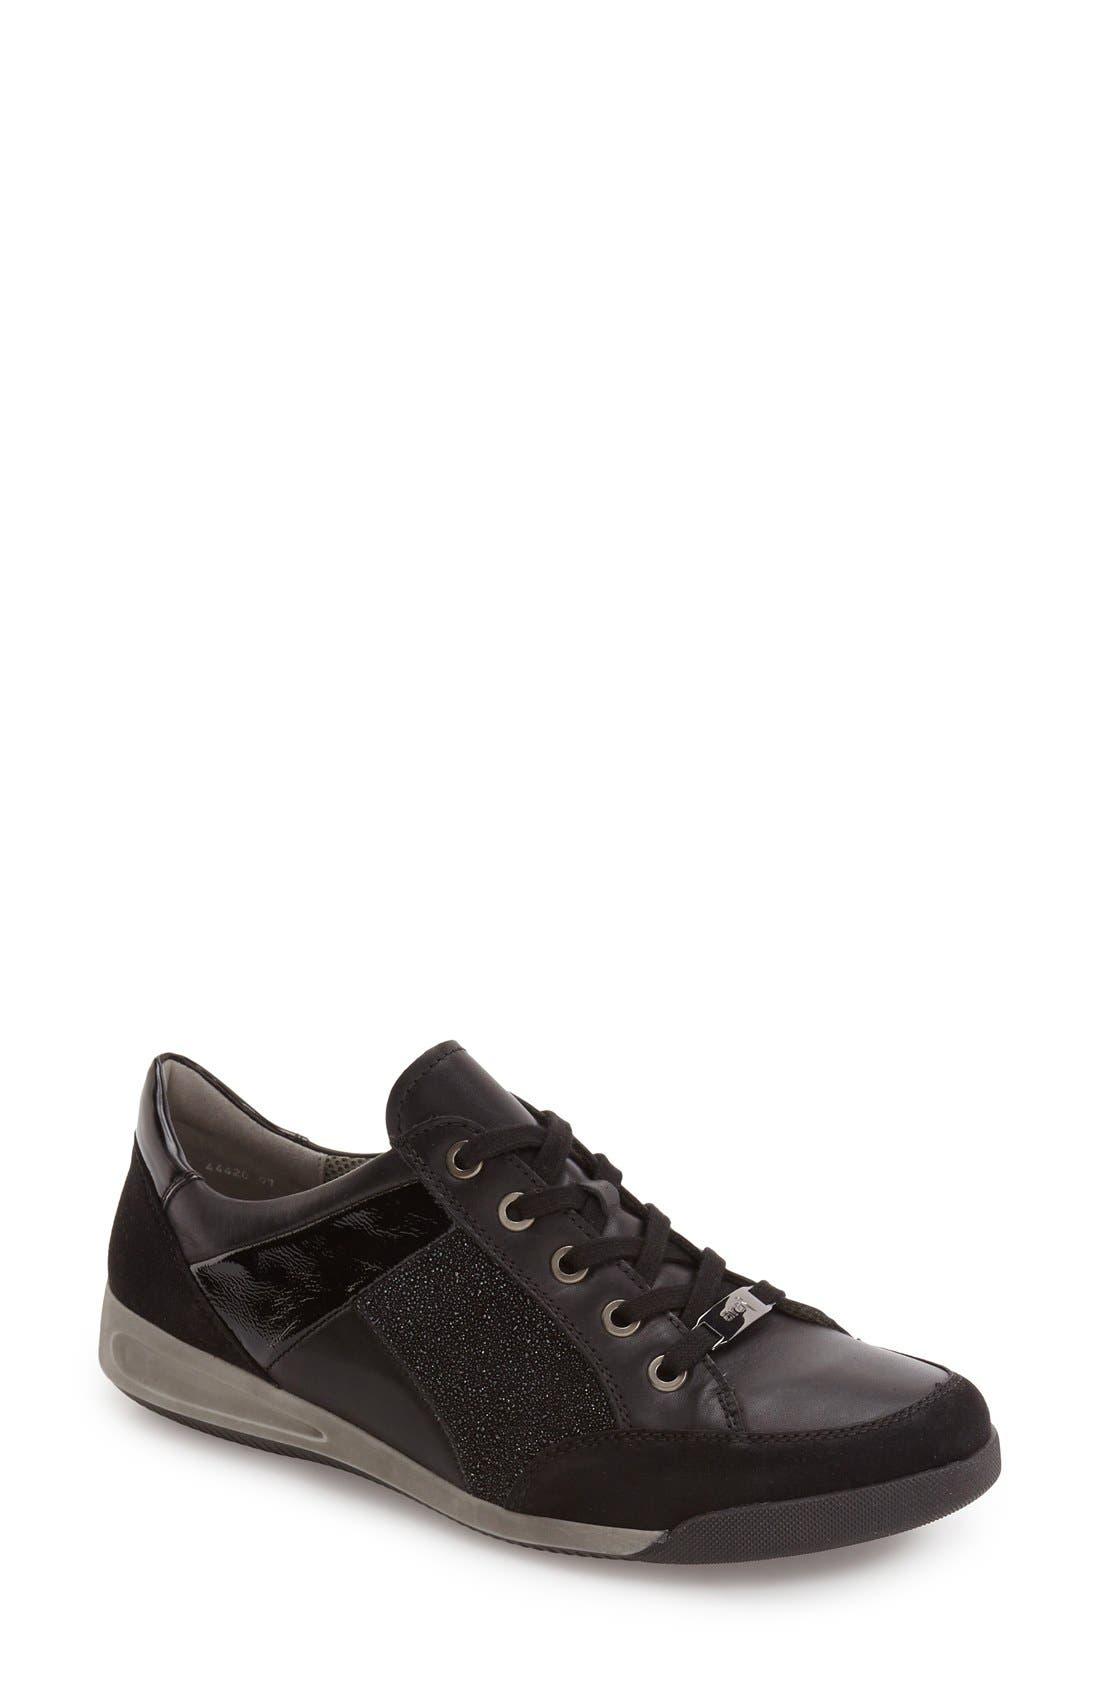 Rina Sneaker,                             Main thumbnail 1, color,                             BLACK SUEDE